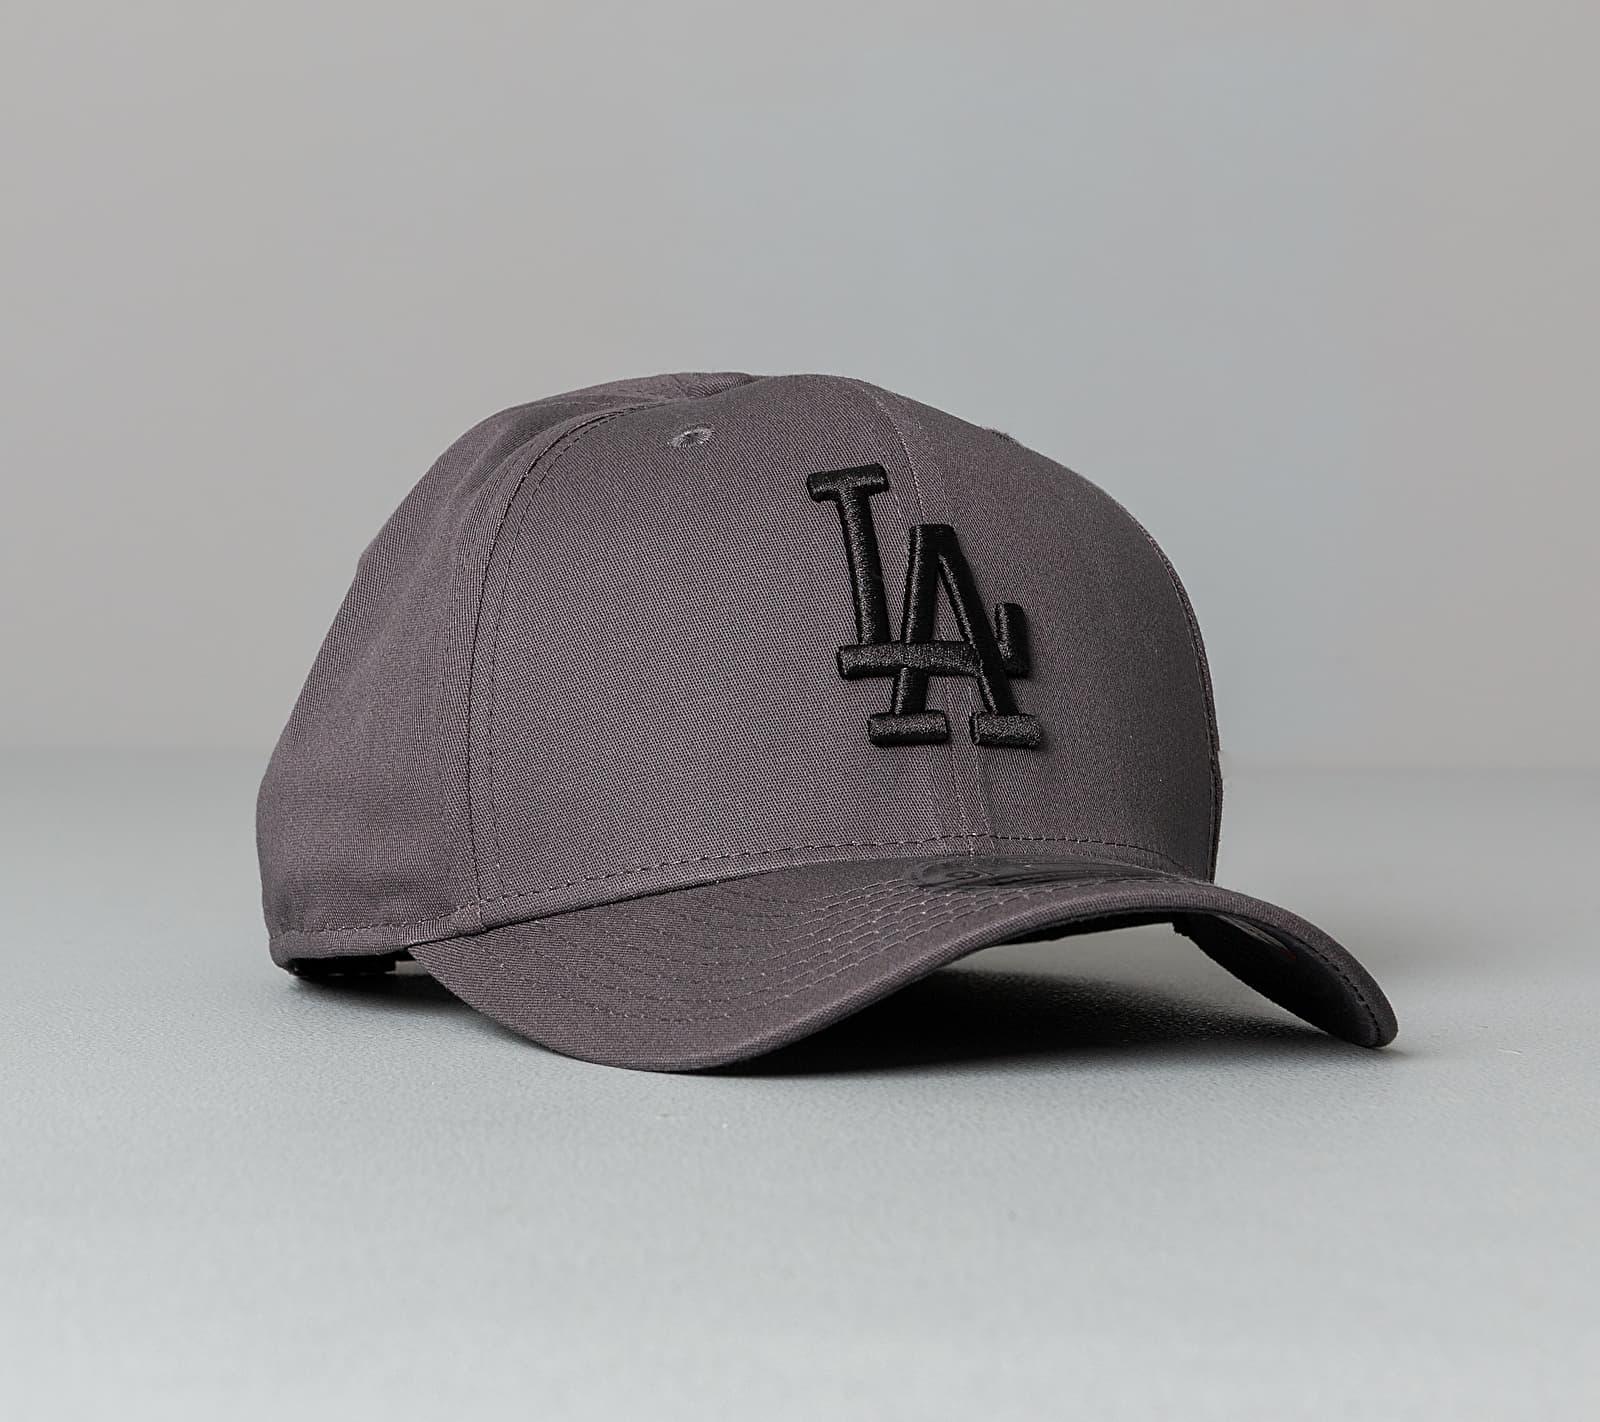 New Era 9Fifty MLB Essential Los Angeles Dodgers Cap Grey S-M